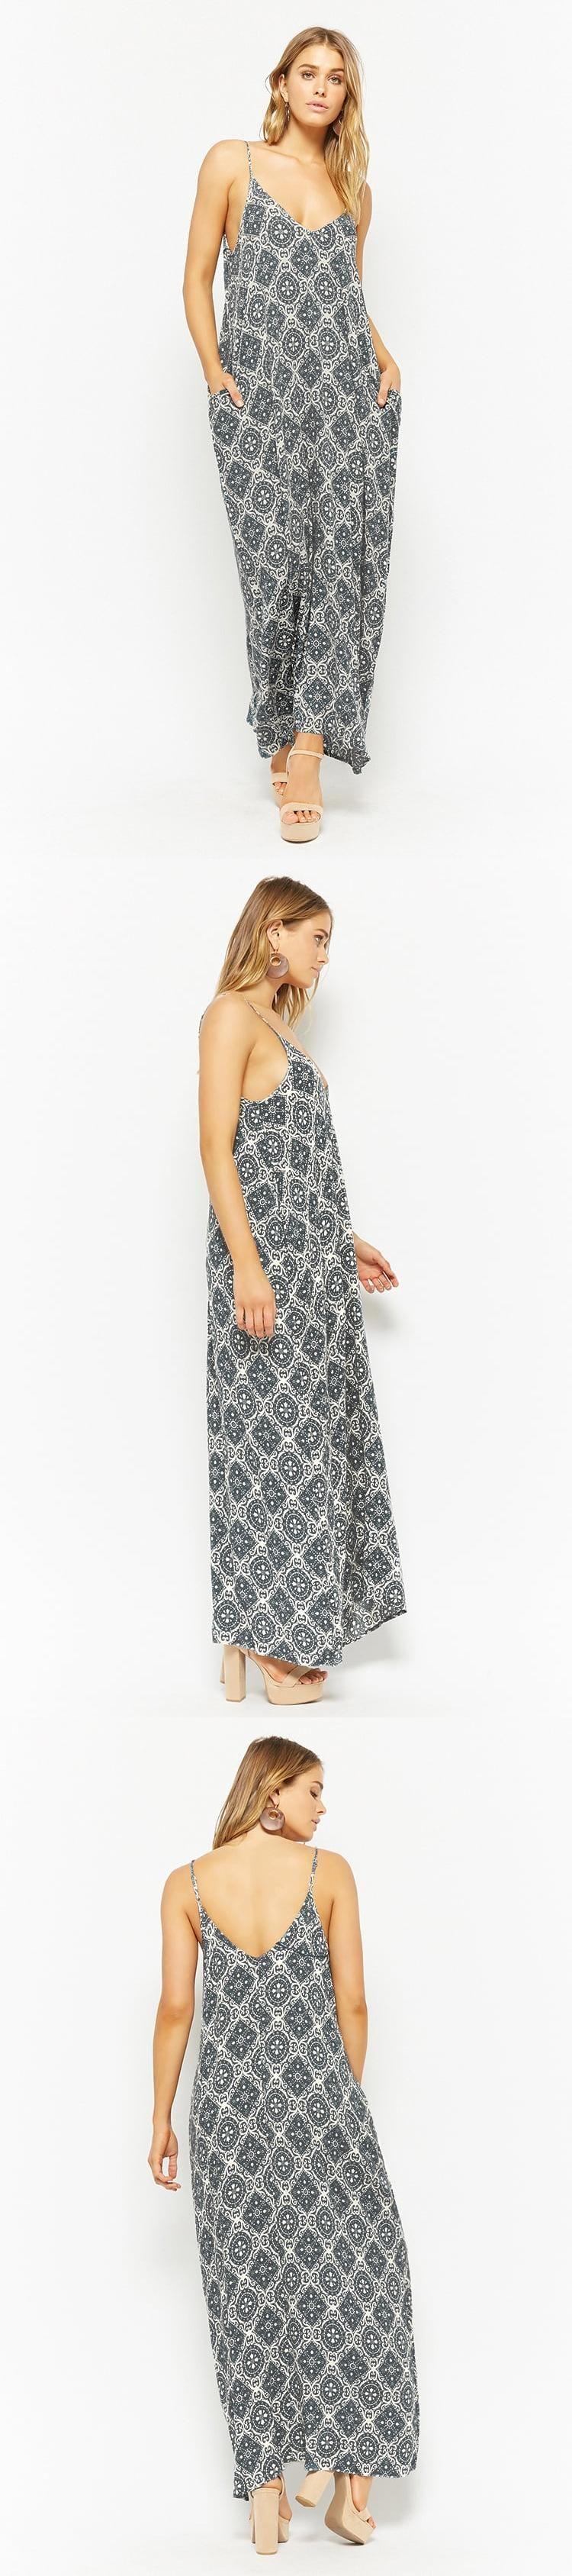 Ornate cami maxi dress usd forever new forever